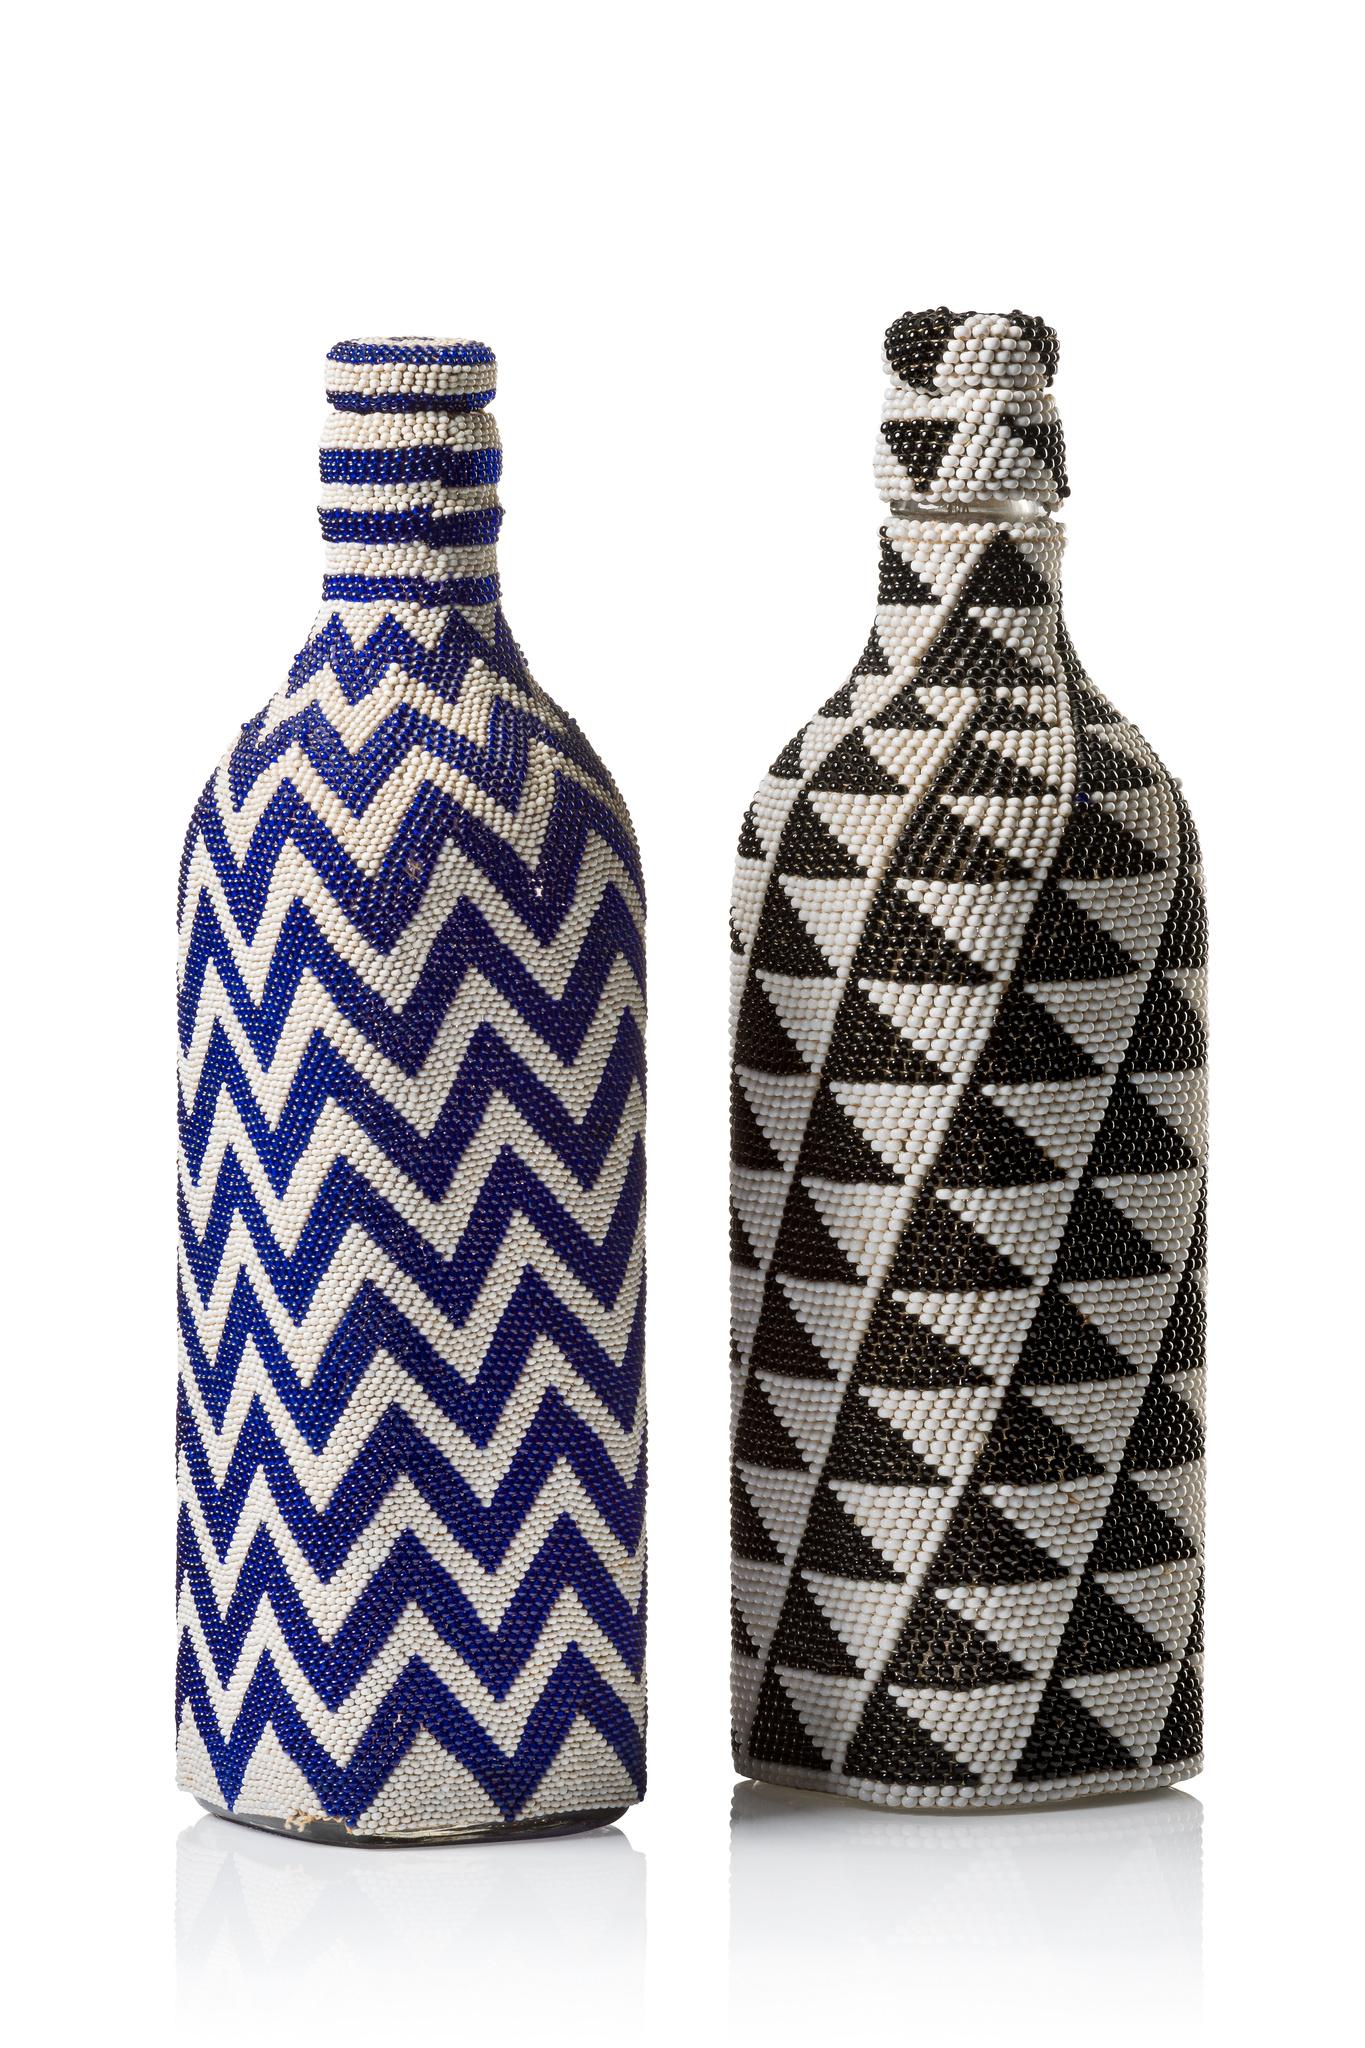 Two prestige or display bottles